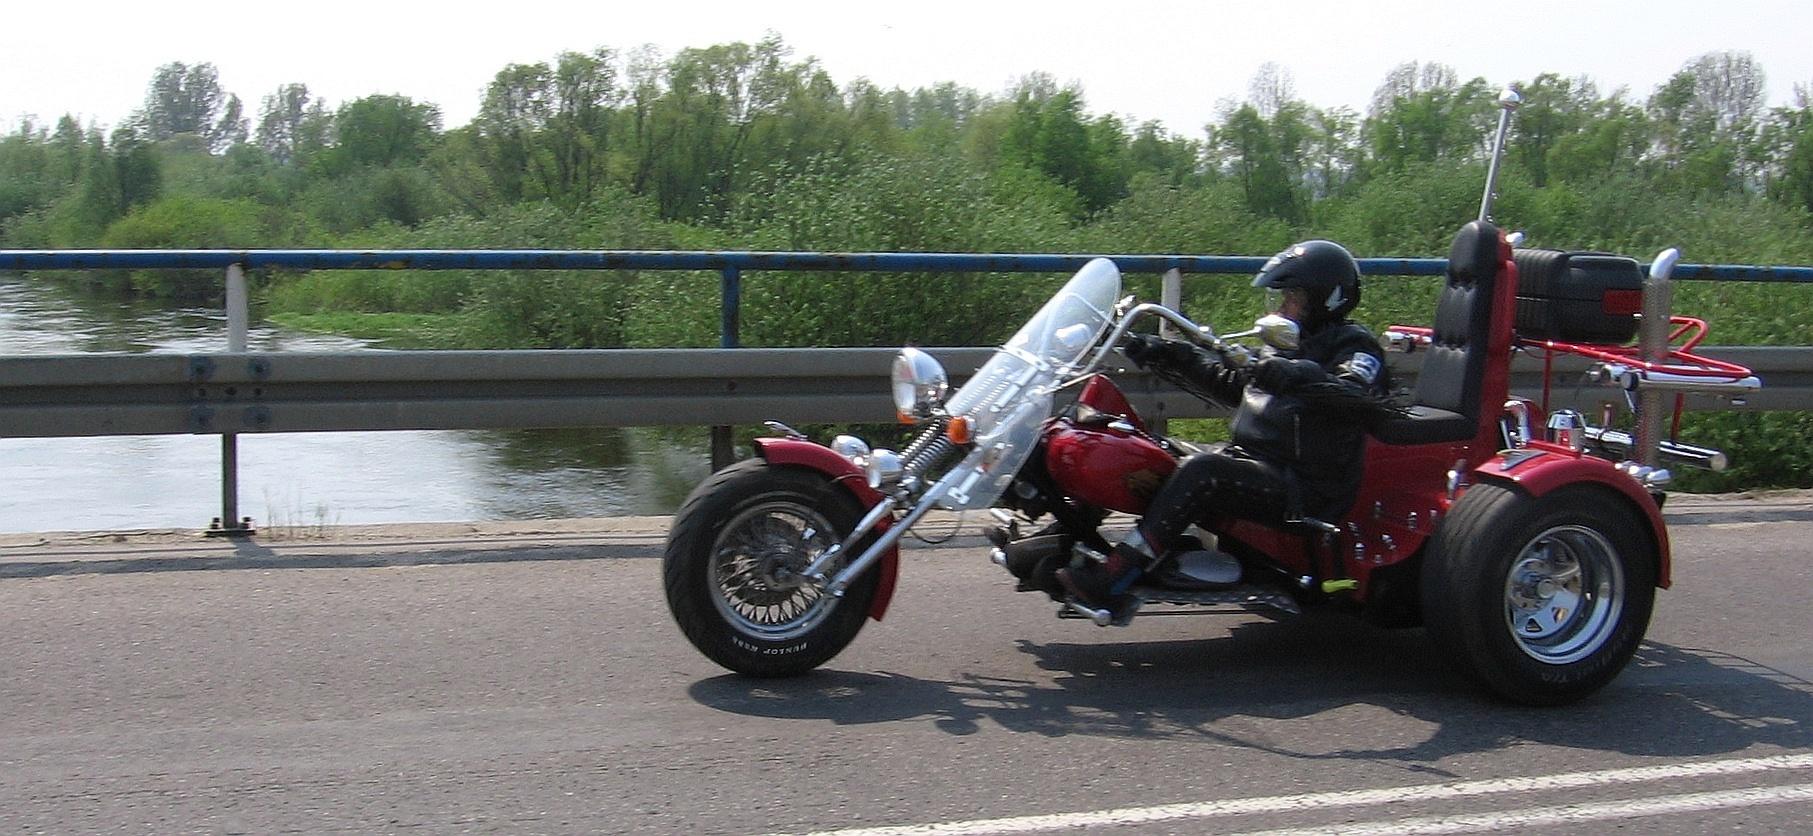 Garage Moto Harley Davidson Correze Gare